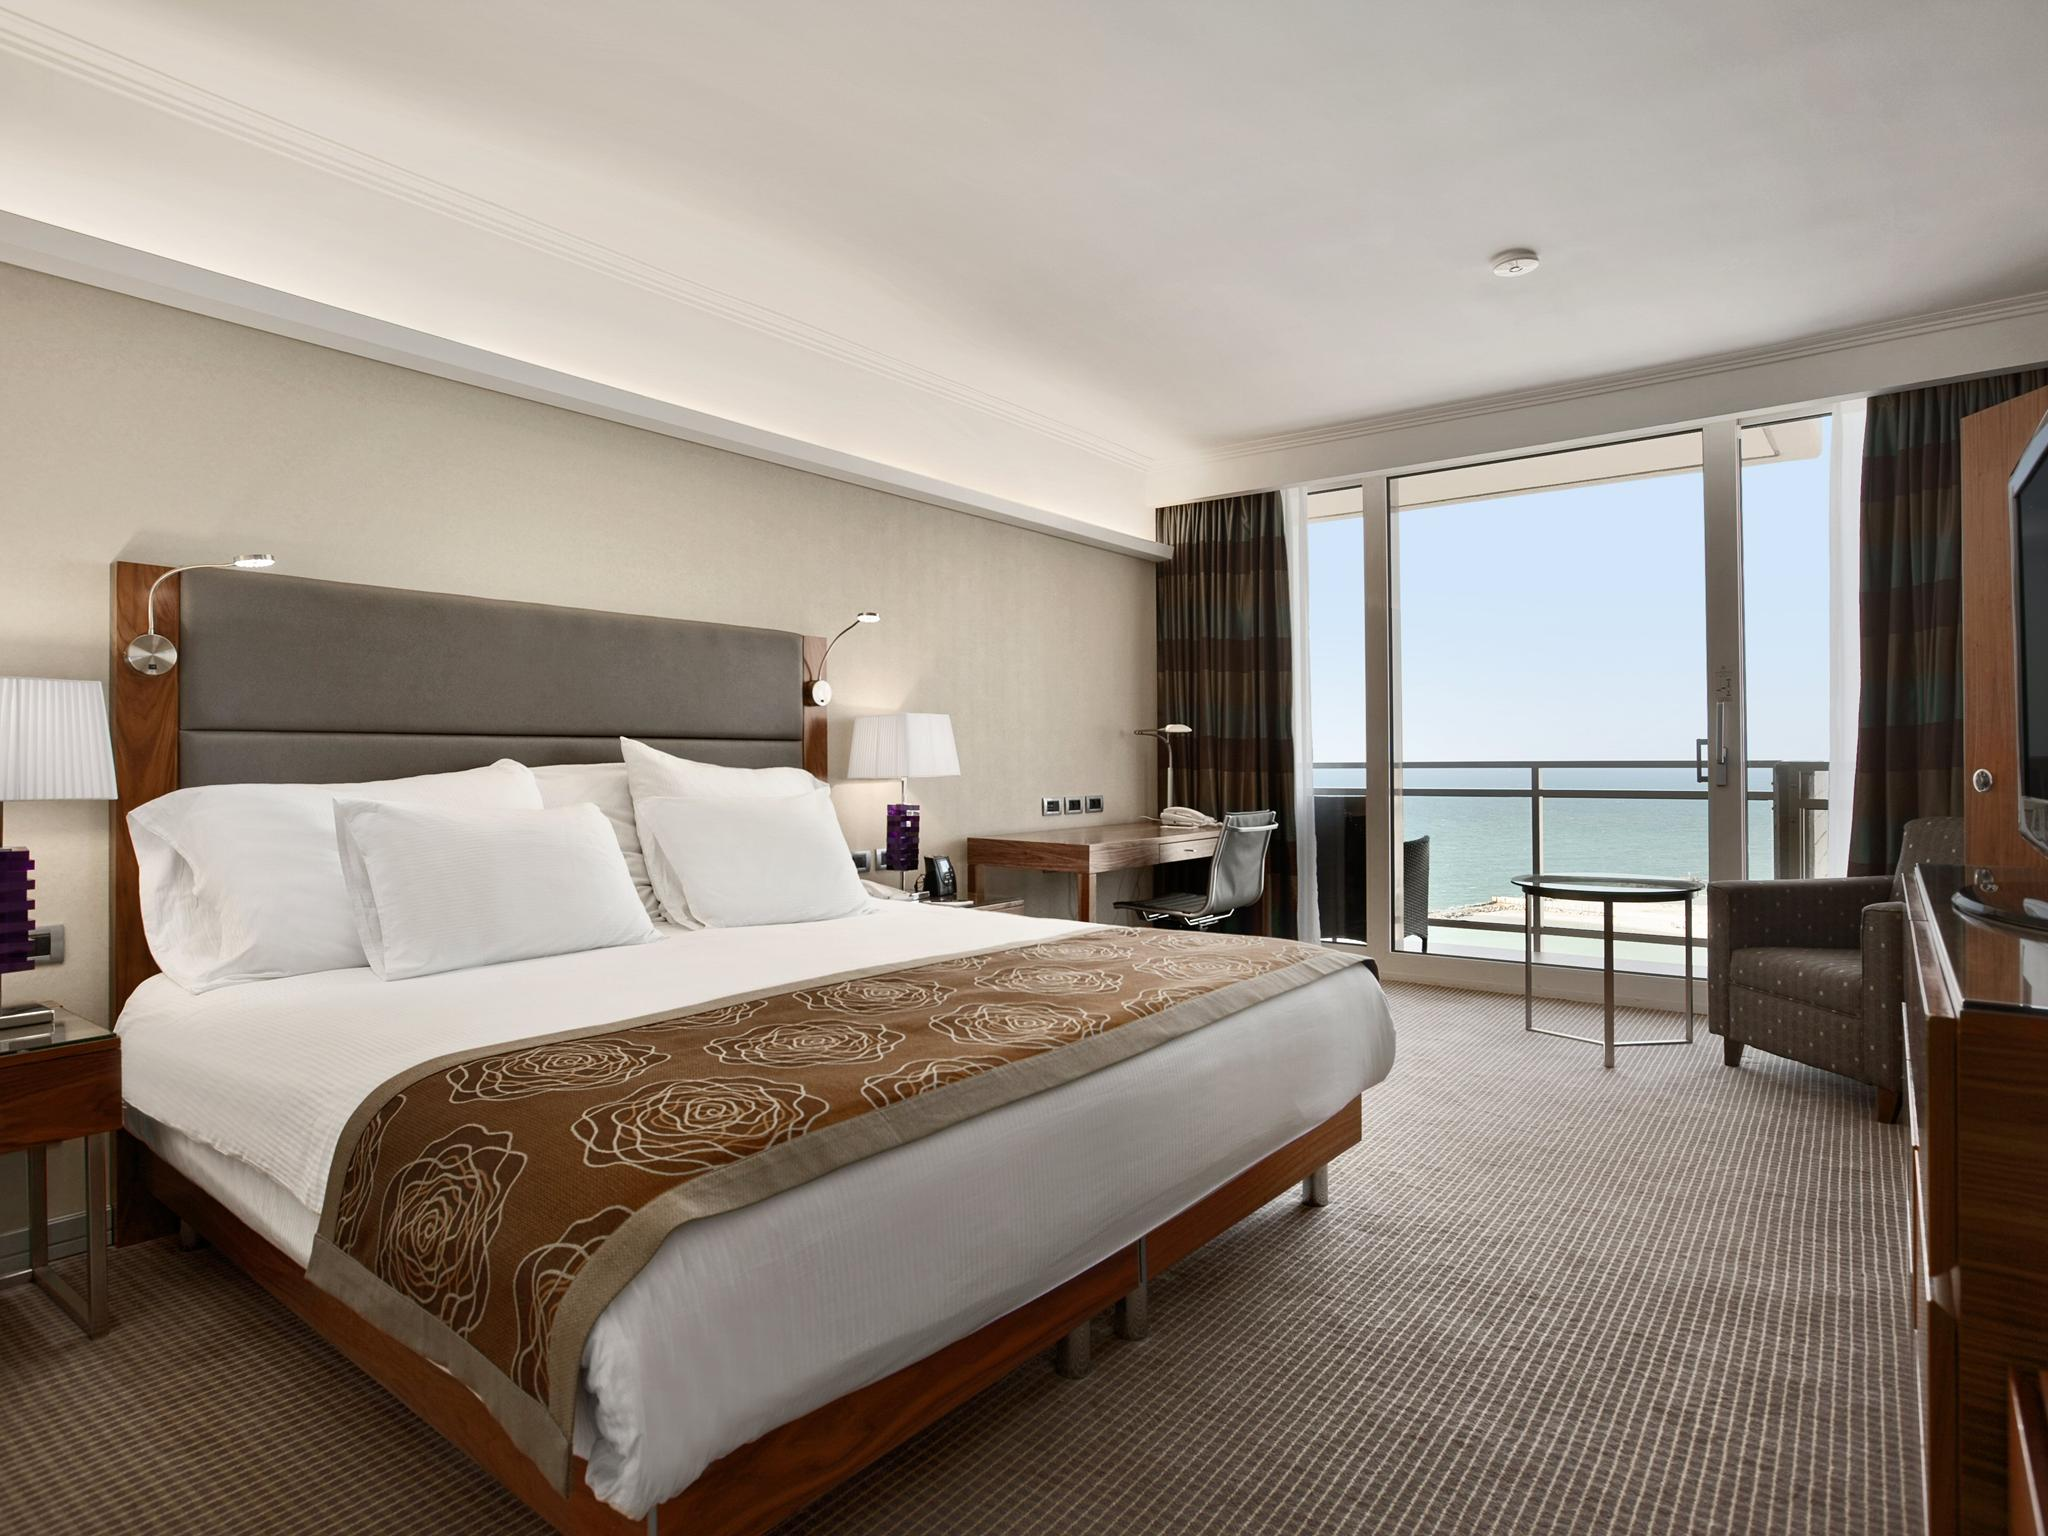 Hilton Tel Aviv Luxushotels Im Stadtzentrum Tel Avivs - Tres grand lit design